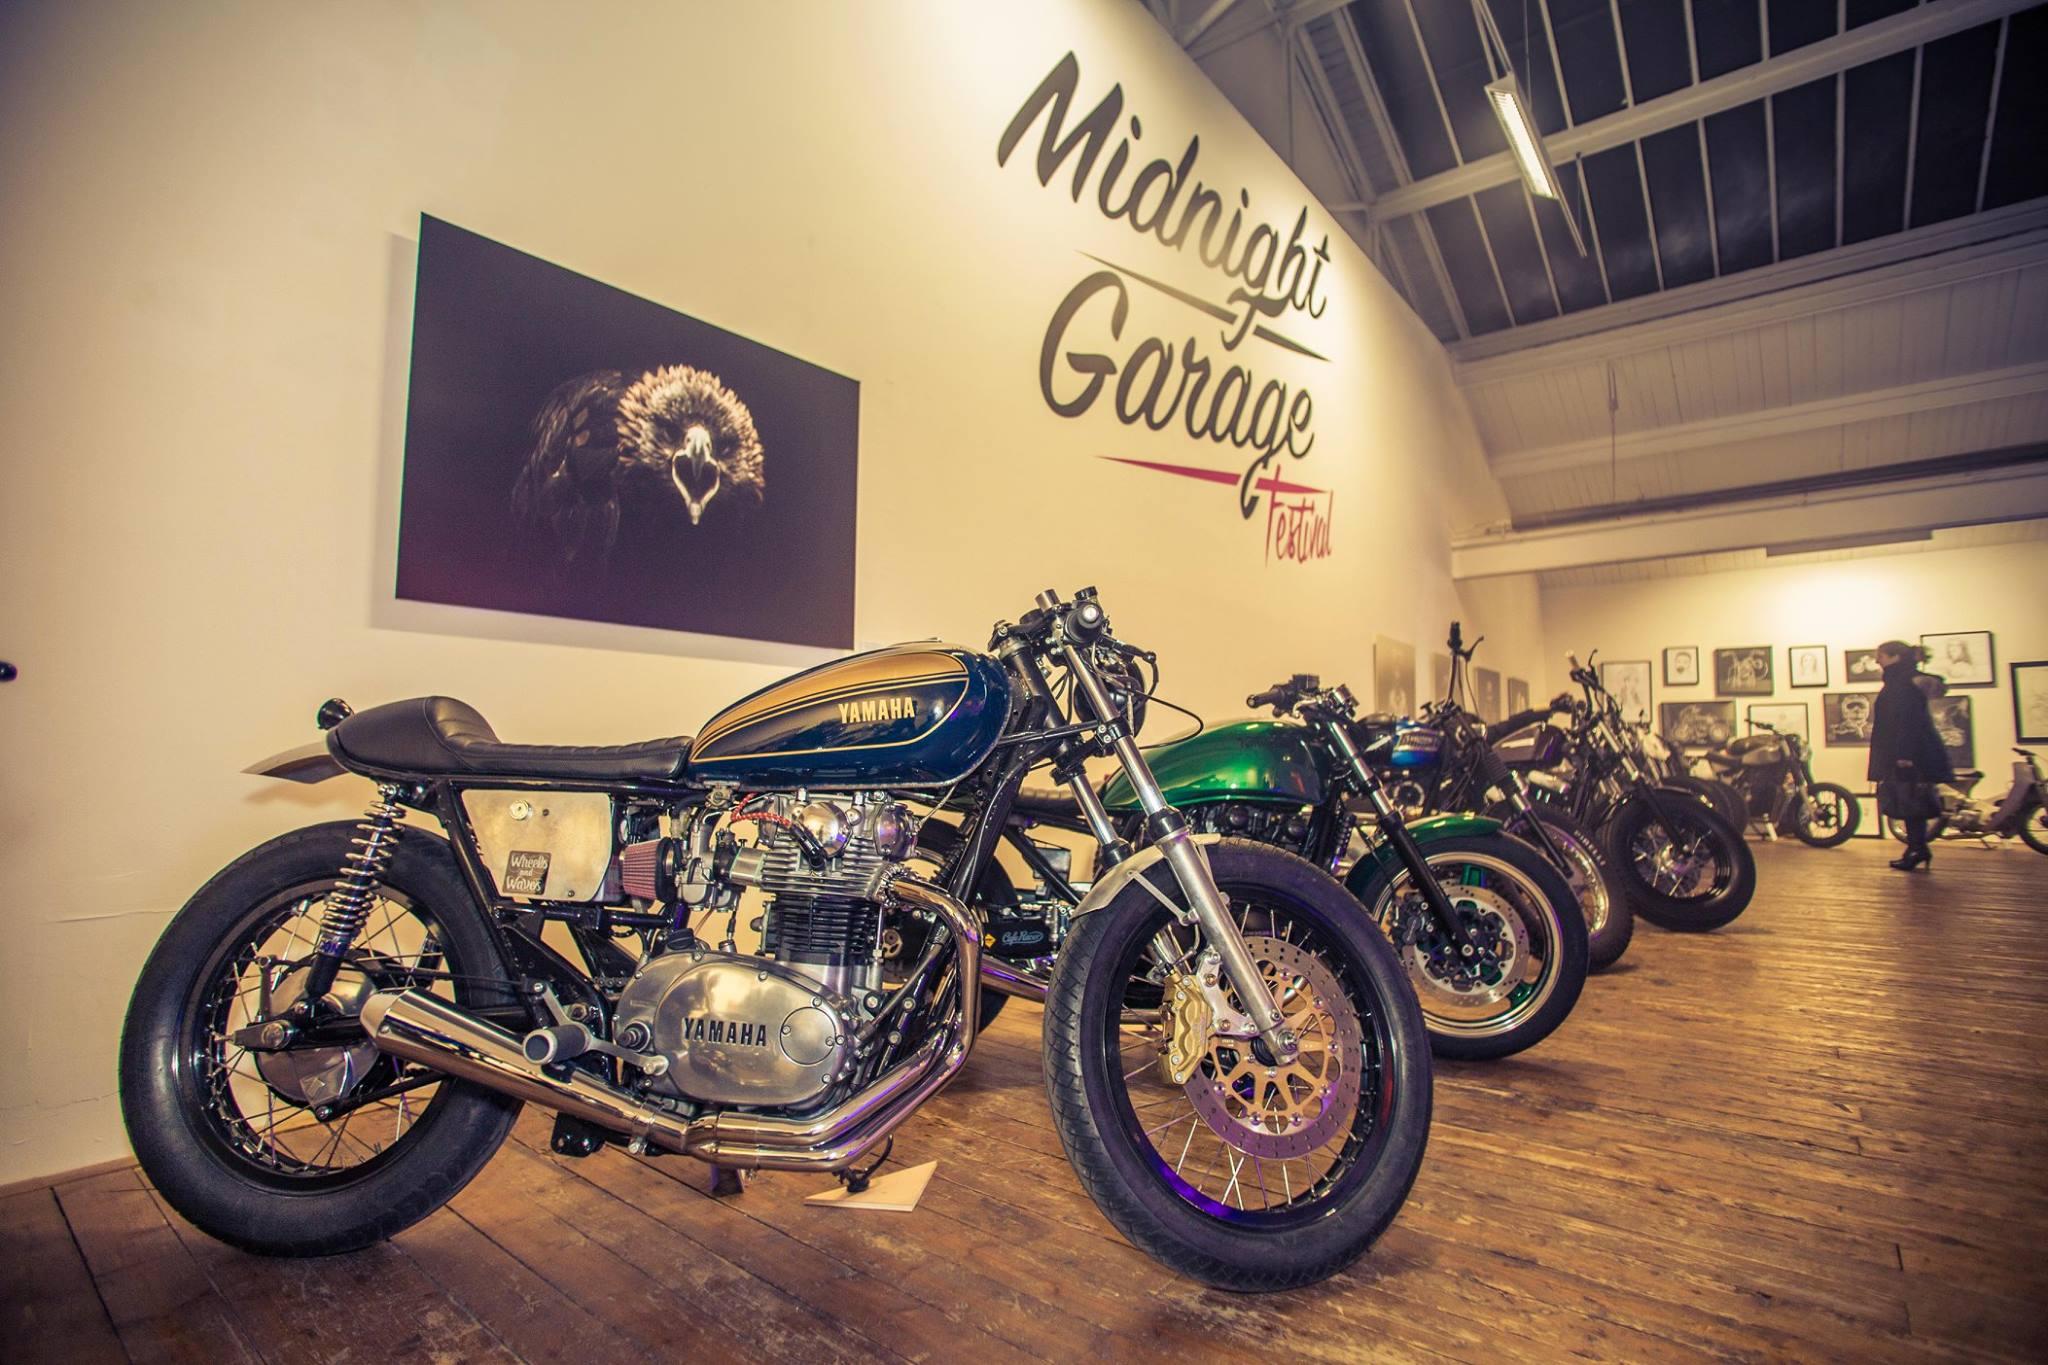 midnight garage motorcycle show 4h10.com